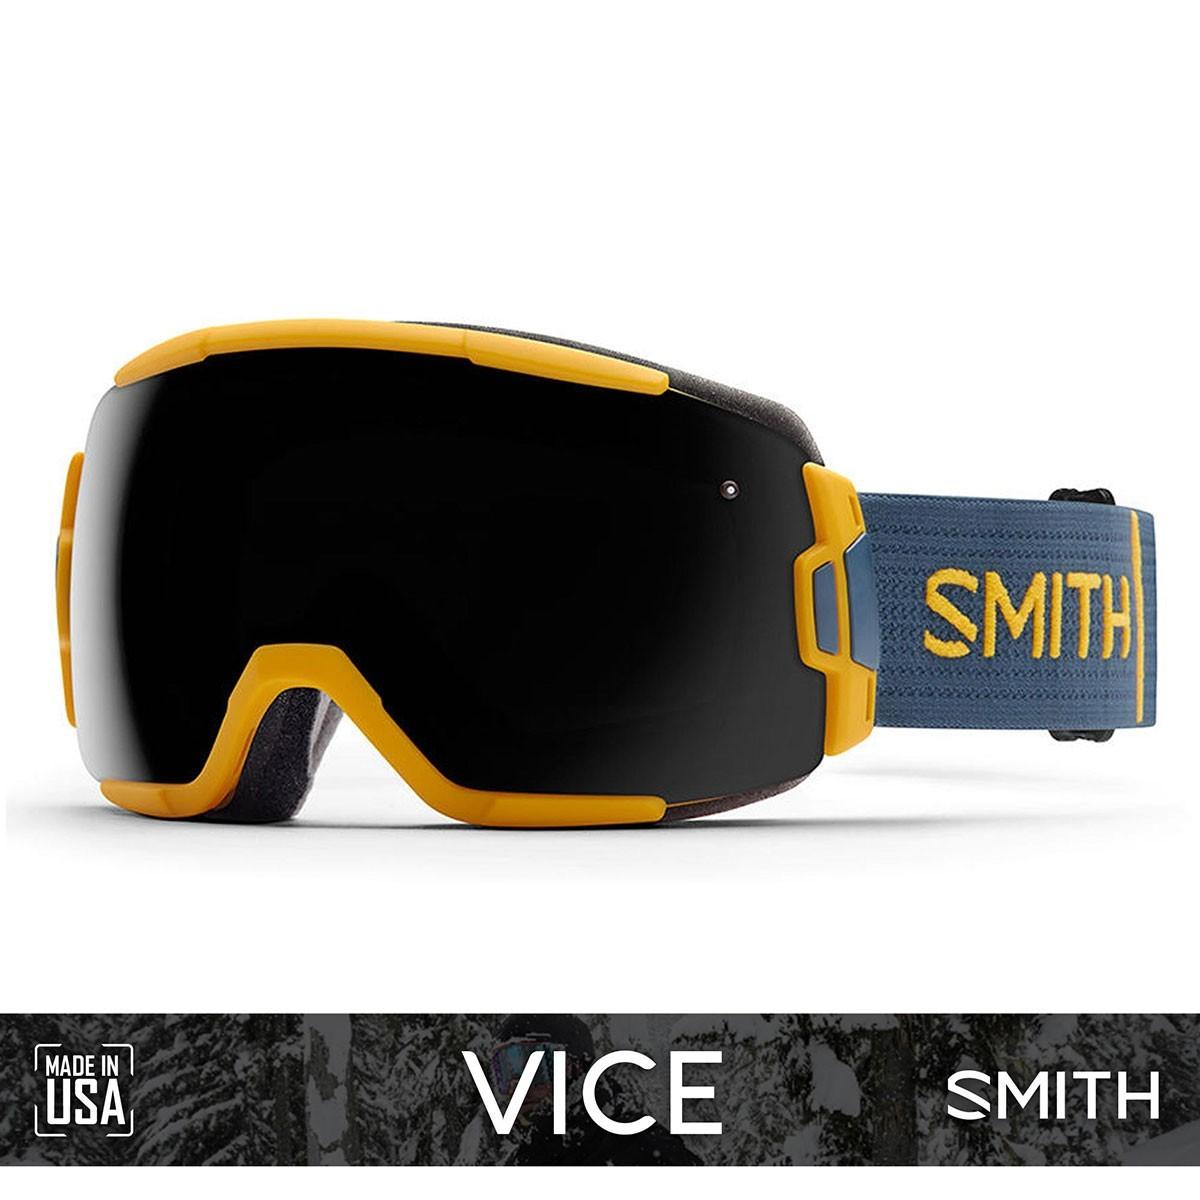 SMITH VICE Mustard Condition | S3 Blackout - Изображение - AQUAMATRIX